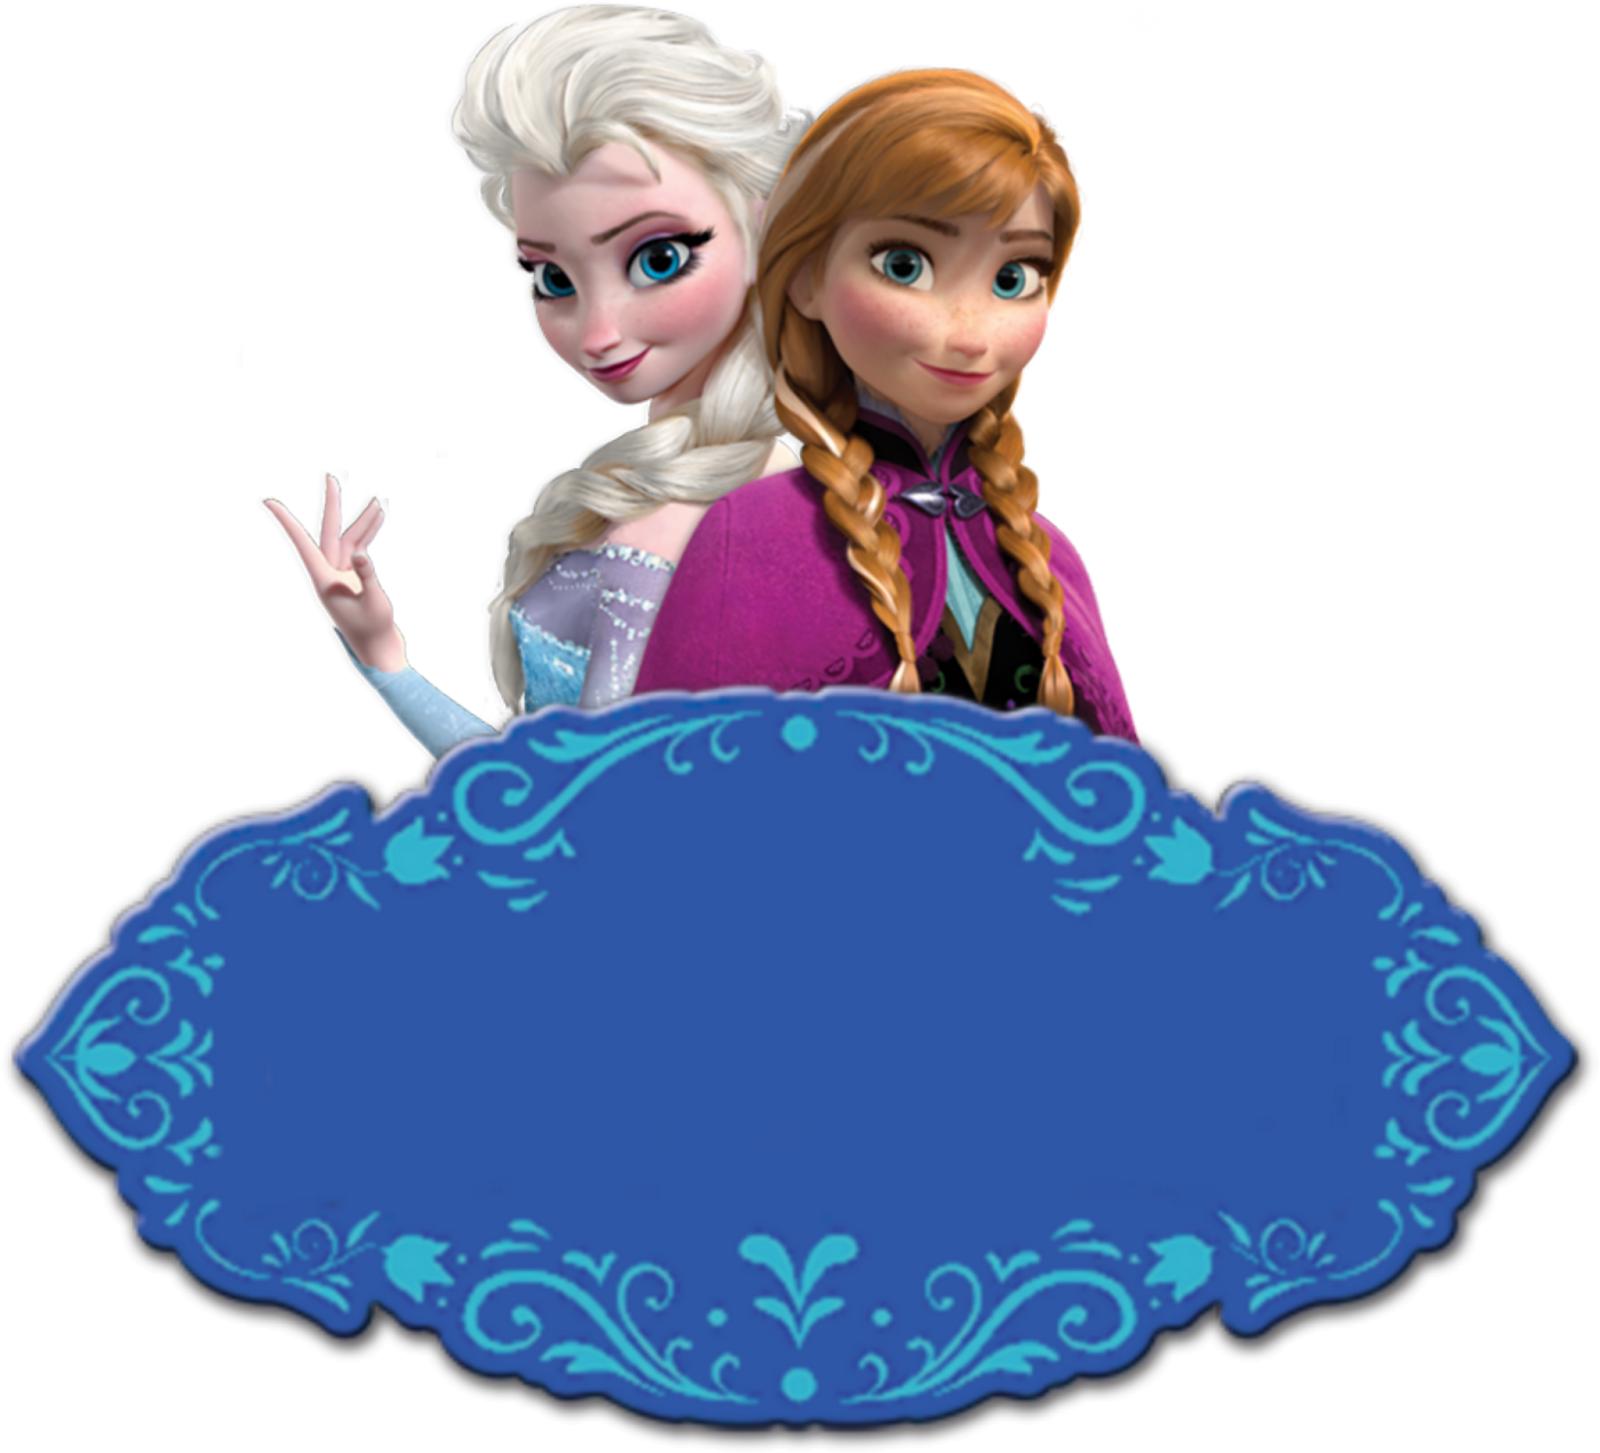 Fazendo a Propria Festa: KIT DE PERSONALIZADOS TEMA FROZEN - Frozen PNG